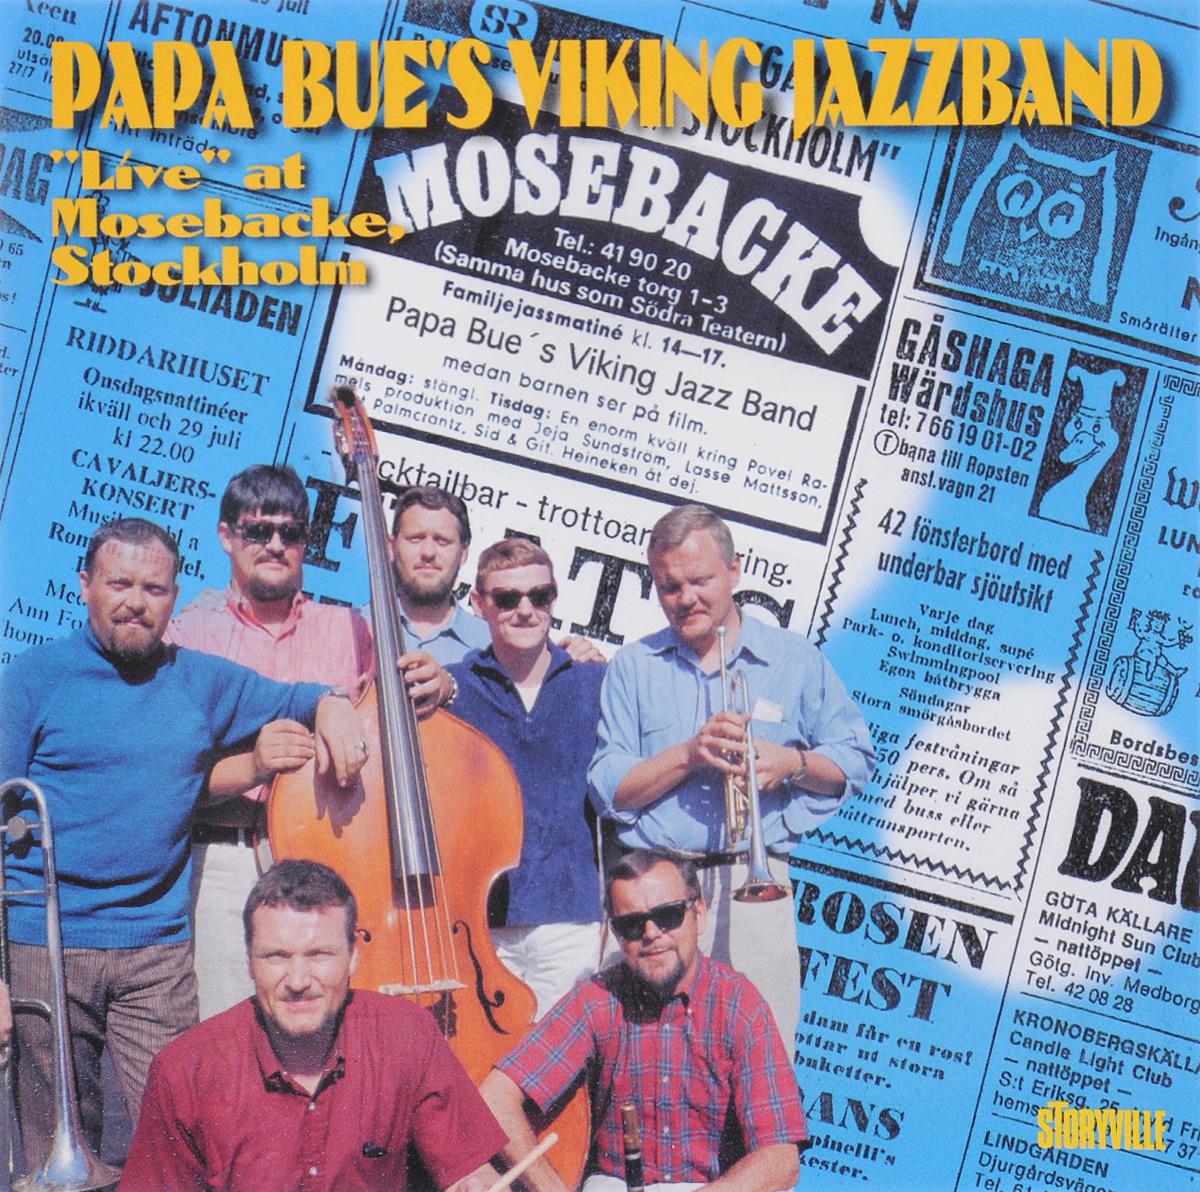 Papa Bue's Viking Jazz Band Papa Bue's Viking Jazzband. Live At Mosebacke, Stockholm stockholm 65 12 30